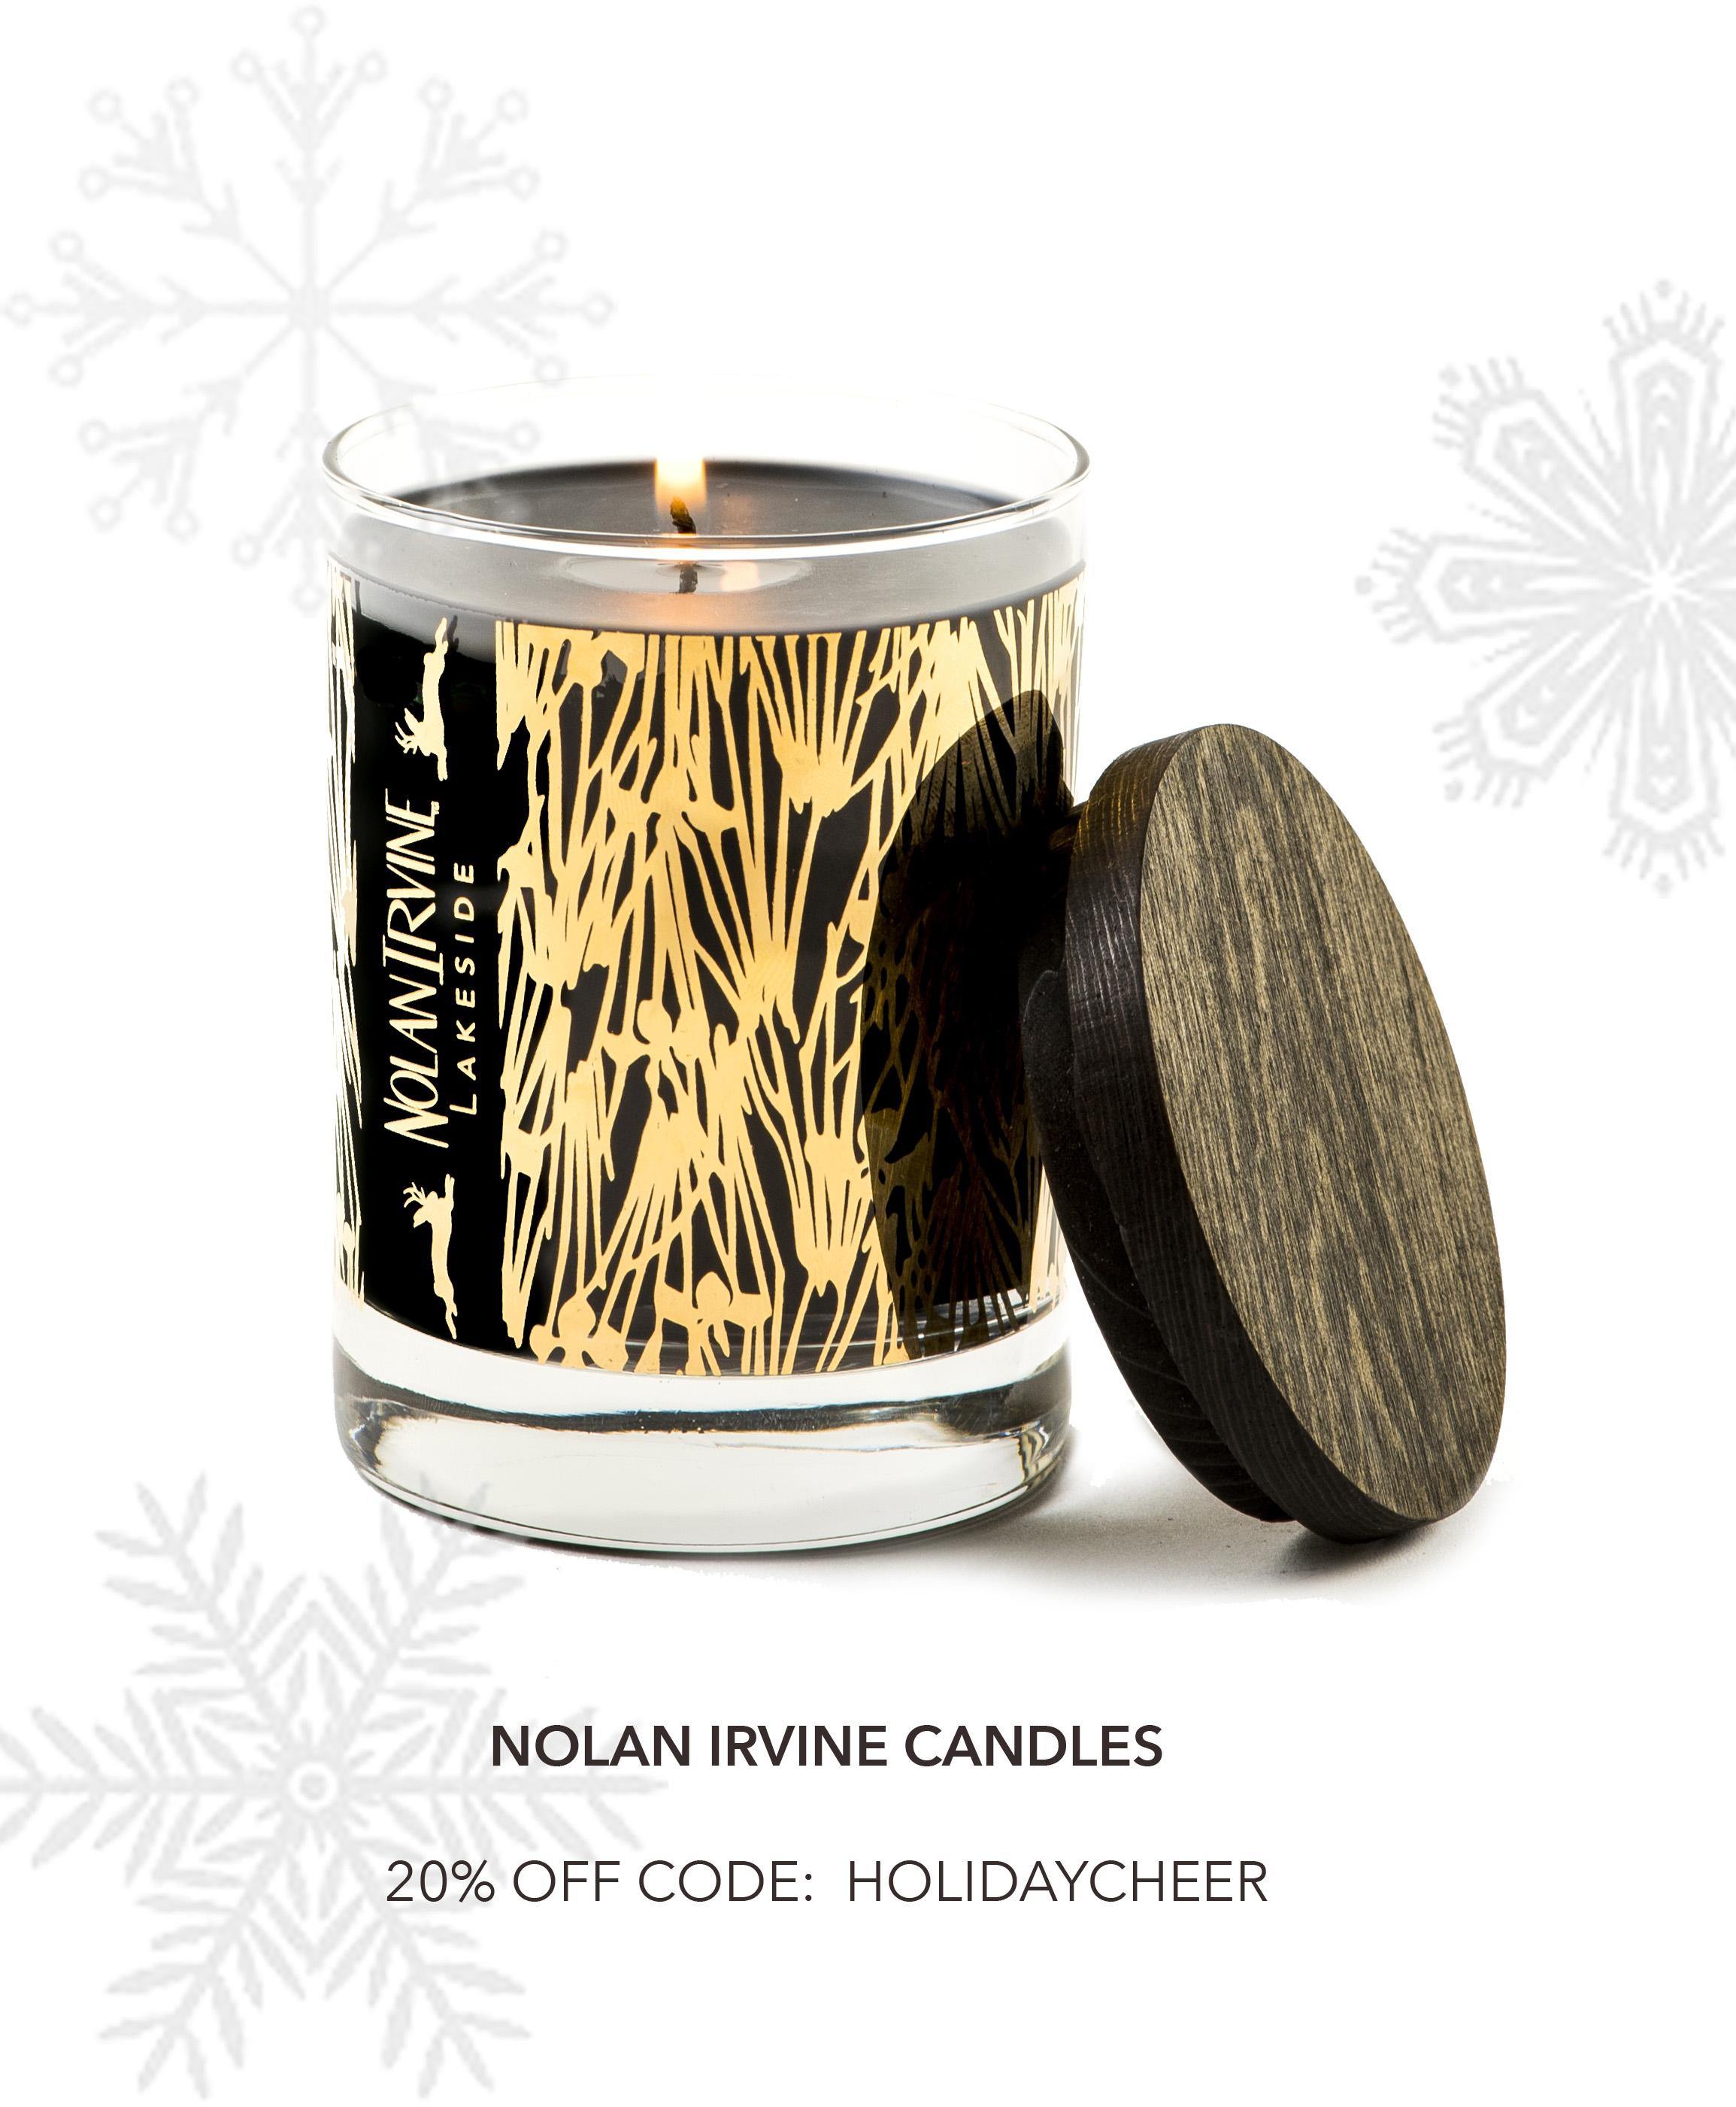 Nolan-Irvine- candle sale.jpg